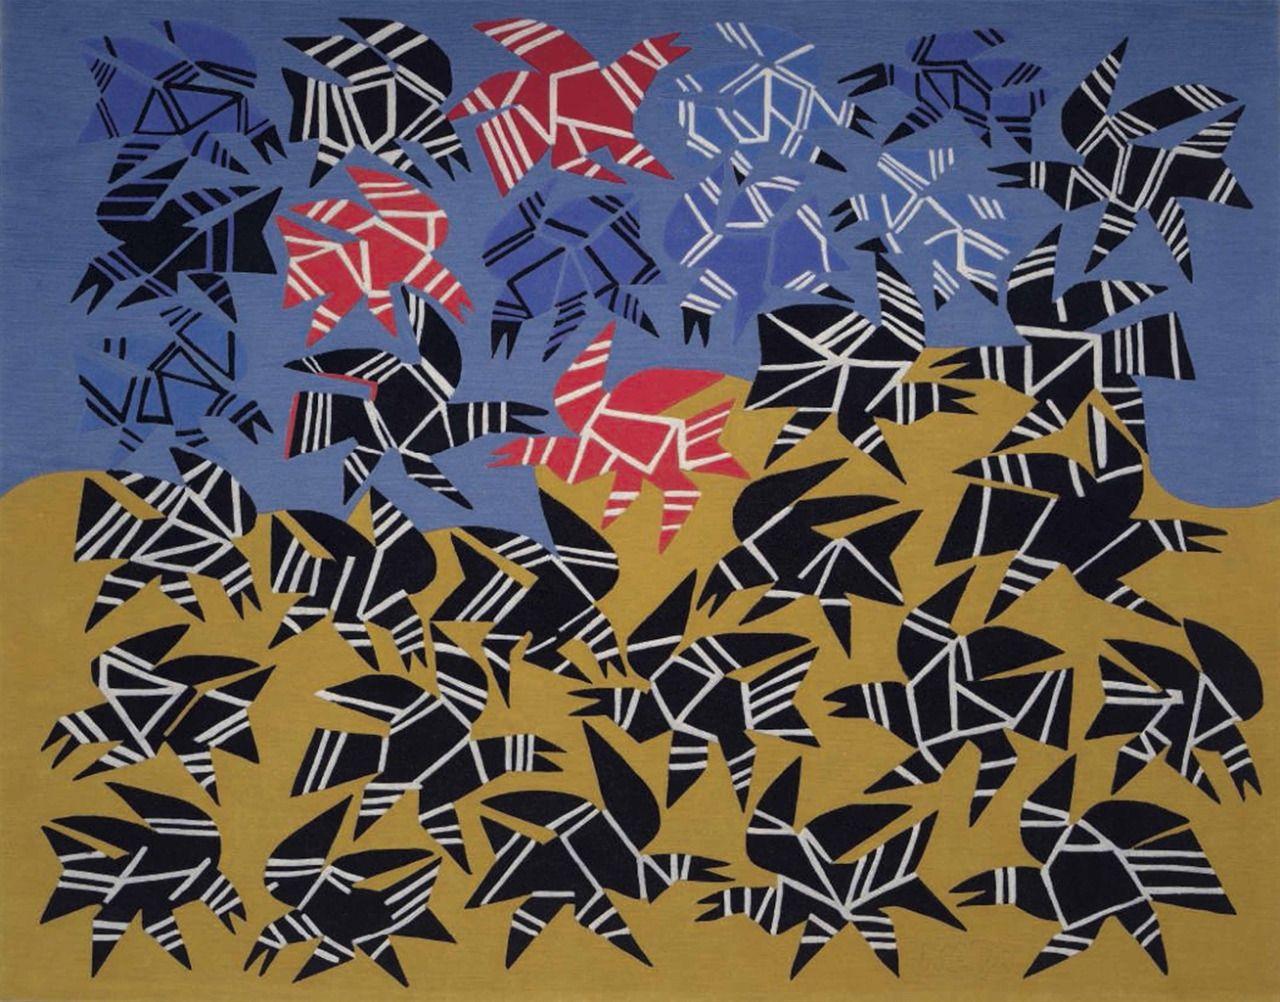 Hussein Madi (Lebanese, b. 1938), Untitled, 2015. Woven carpet, 180 x 230 cm.